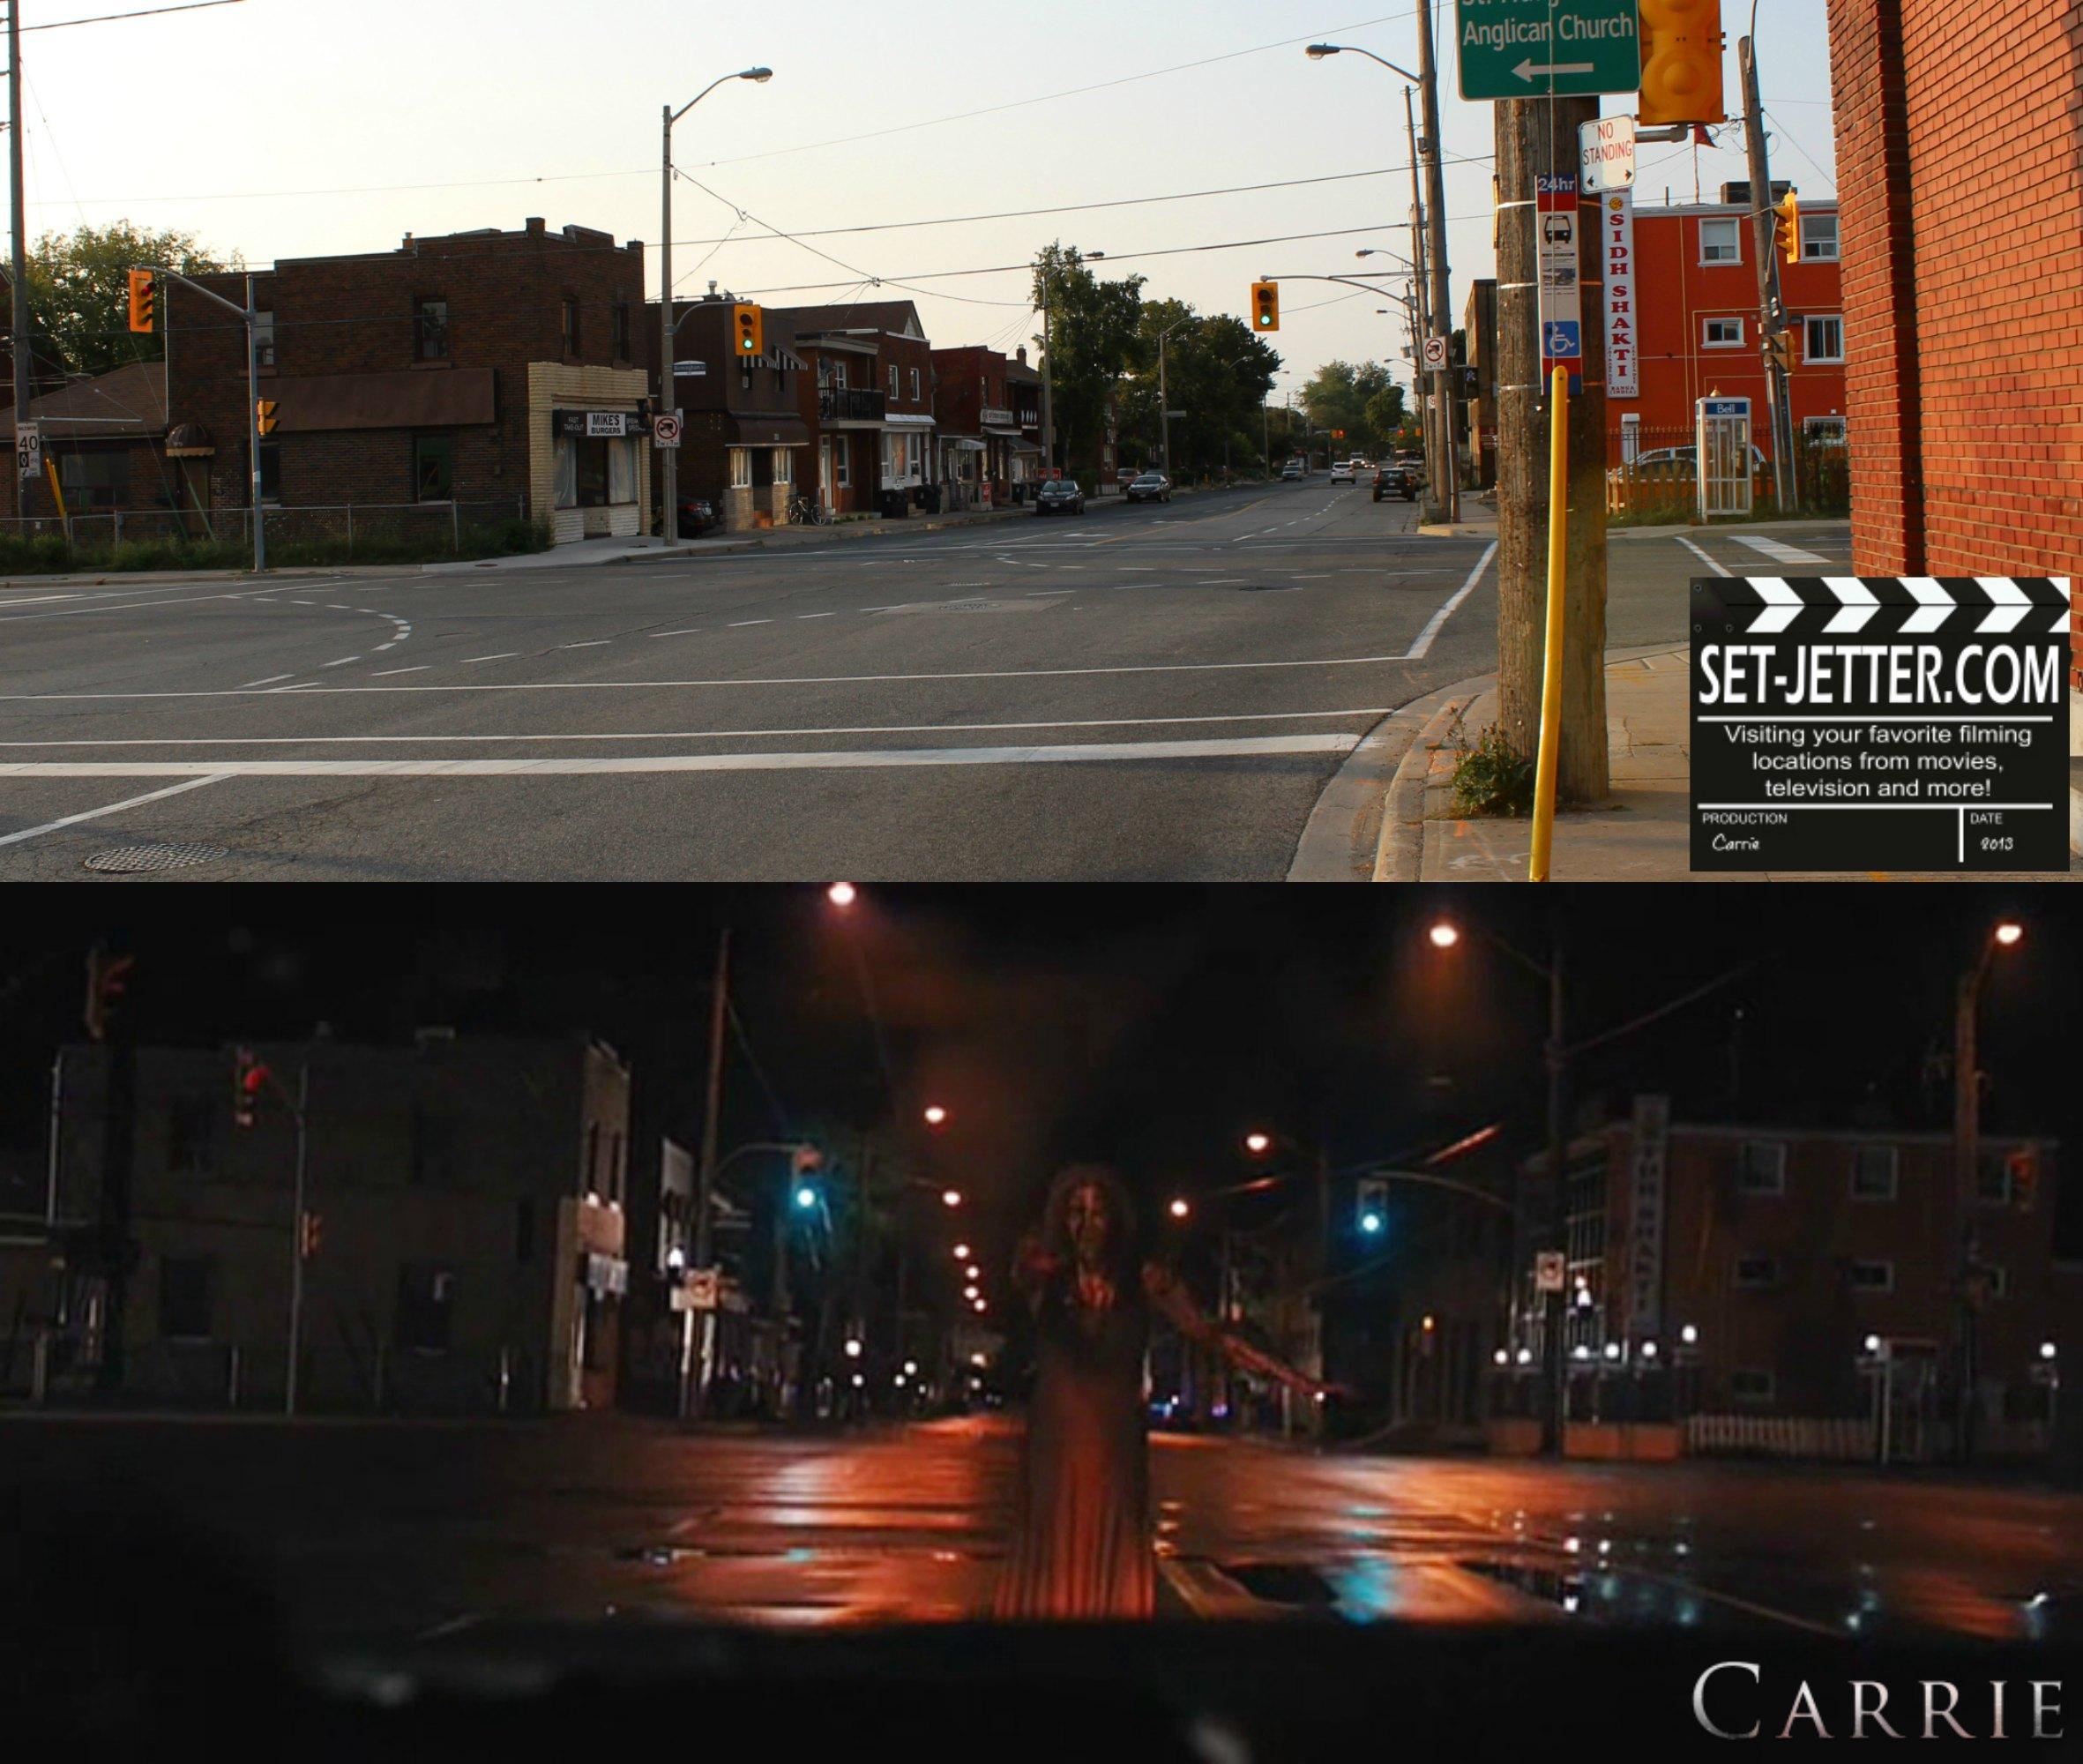 Carrie 2013 comparison 176.jpg